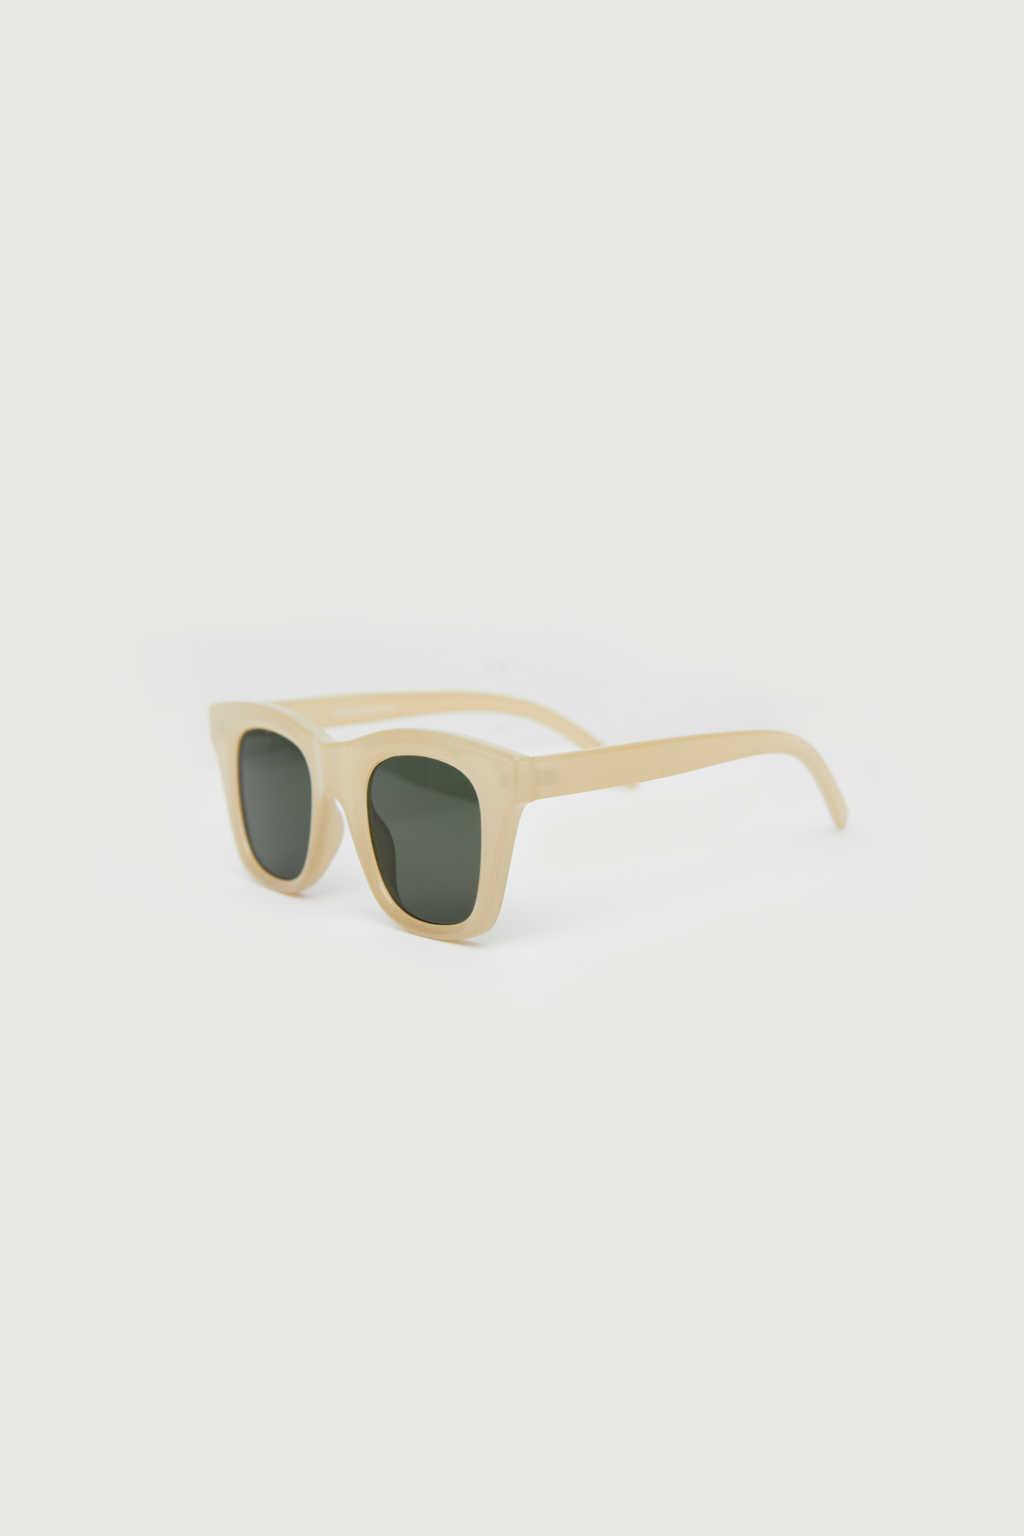 Sunglass 3371 Cream 5